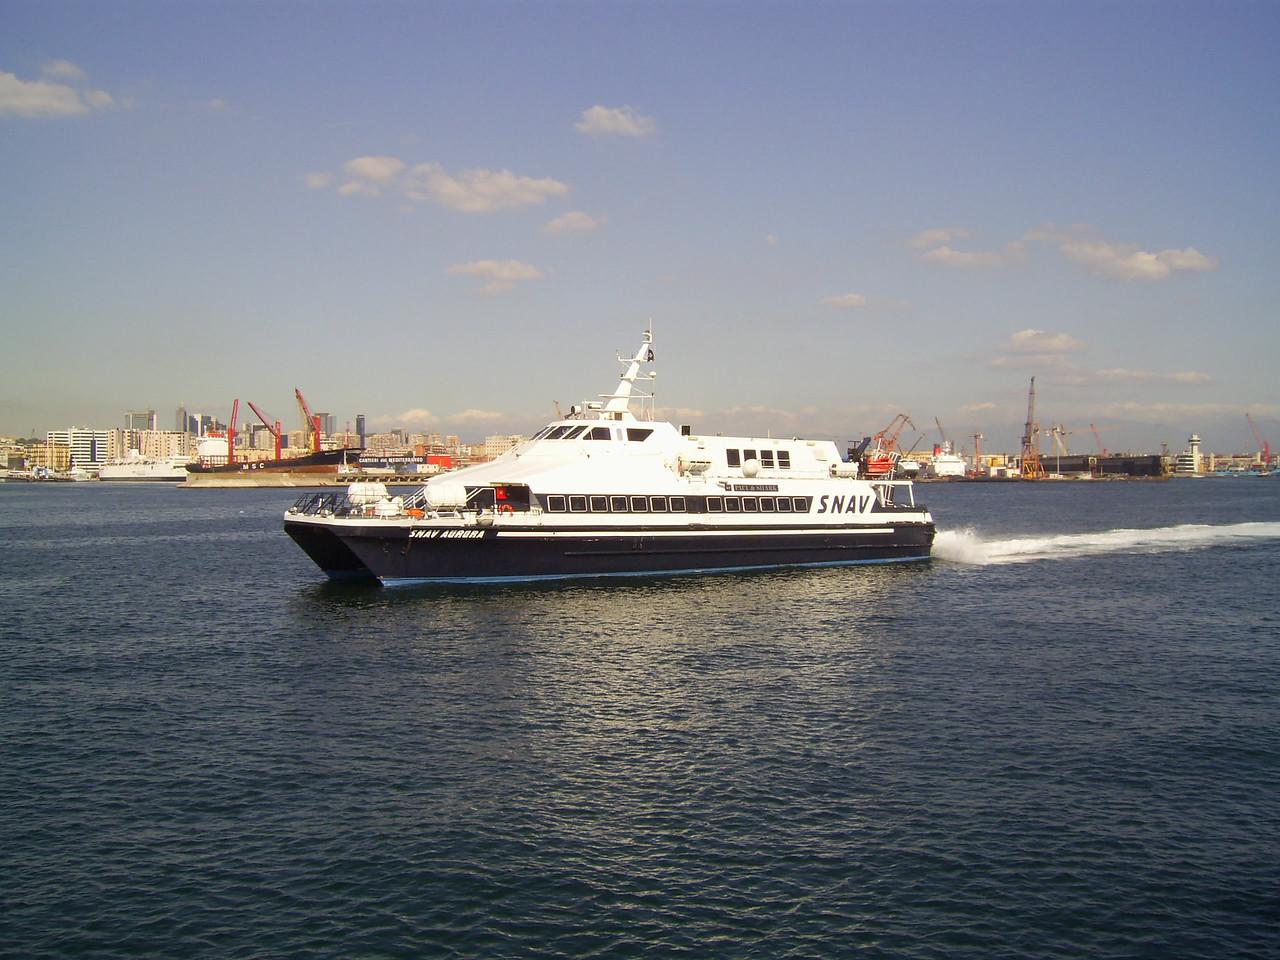 2010 - HSC SNAV AURORA arriving to Napoli.